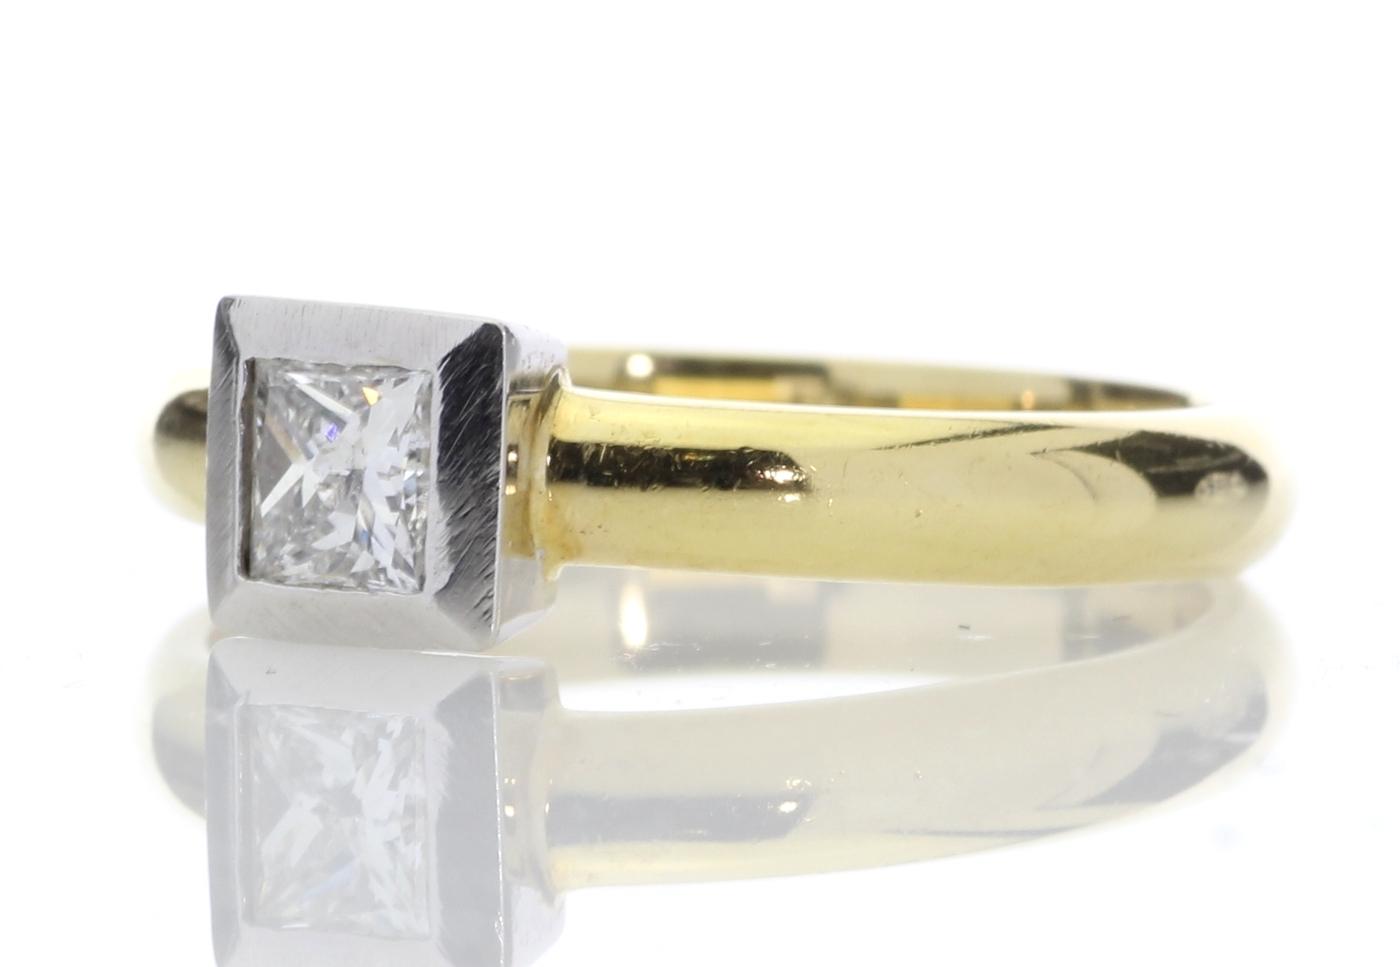 18ct Princess Cut Rub Over Diamond Ring 0.45 Carats - Image 2 of 8